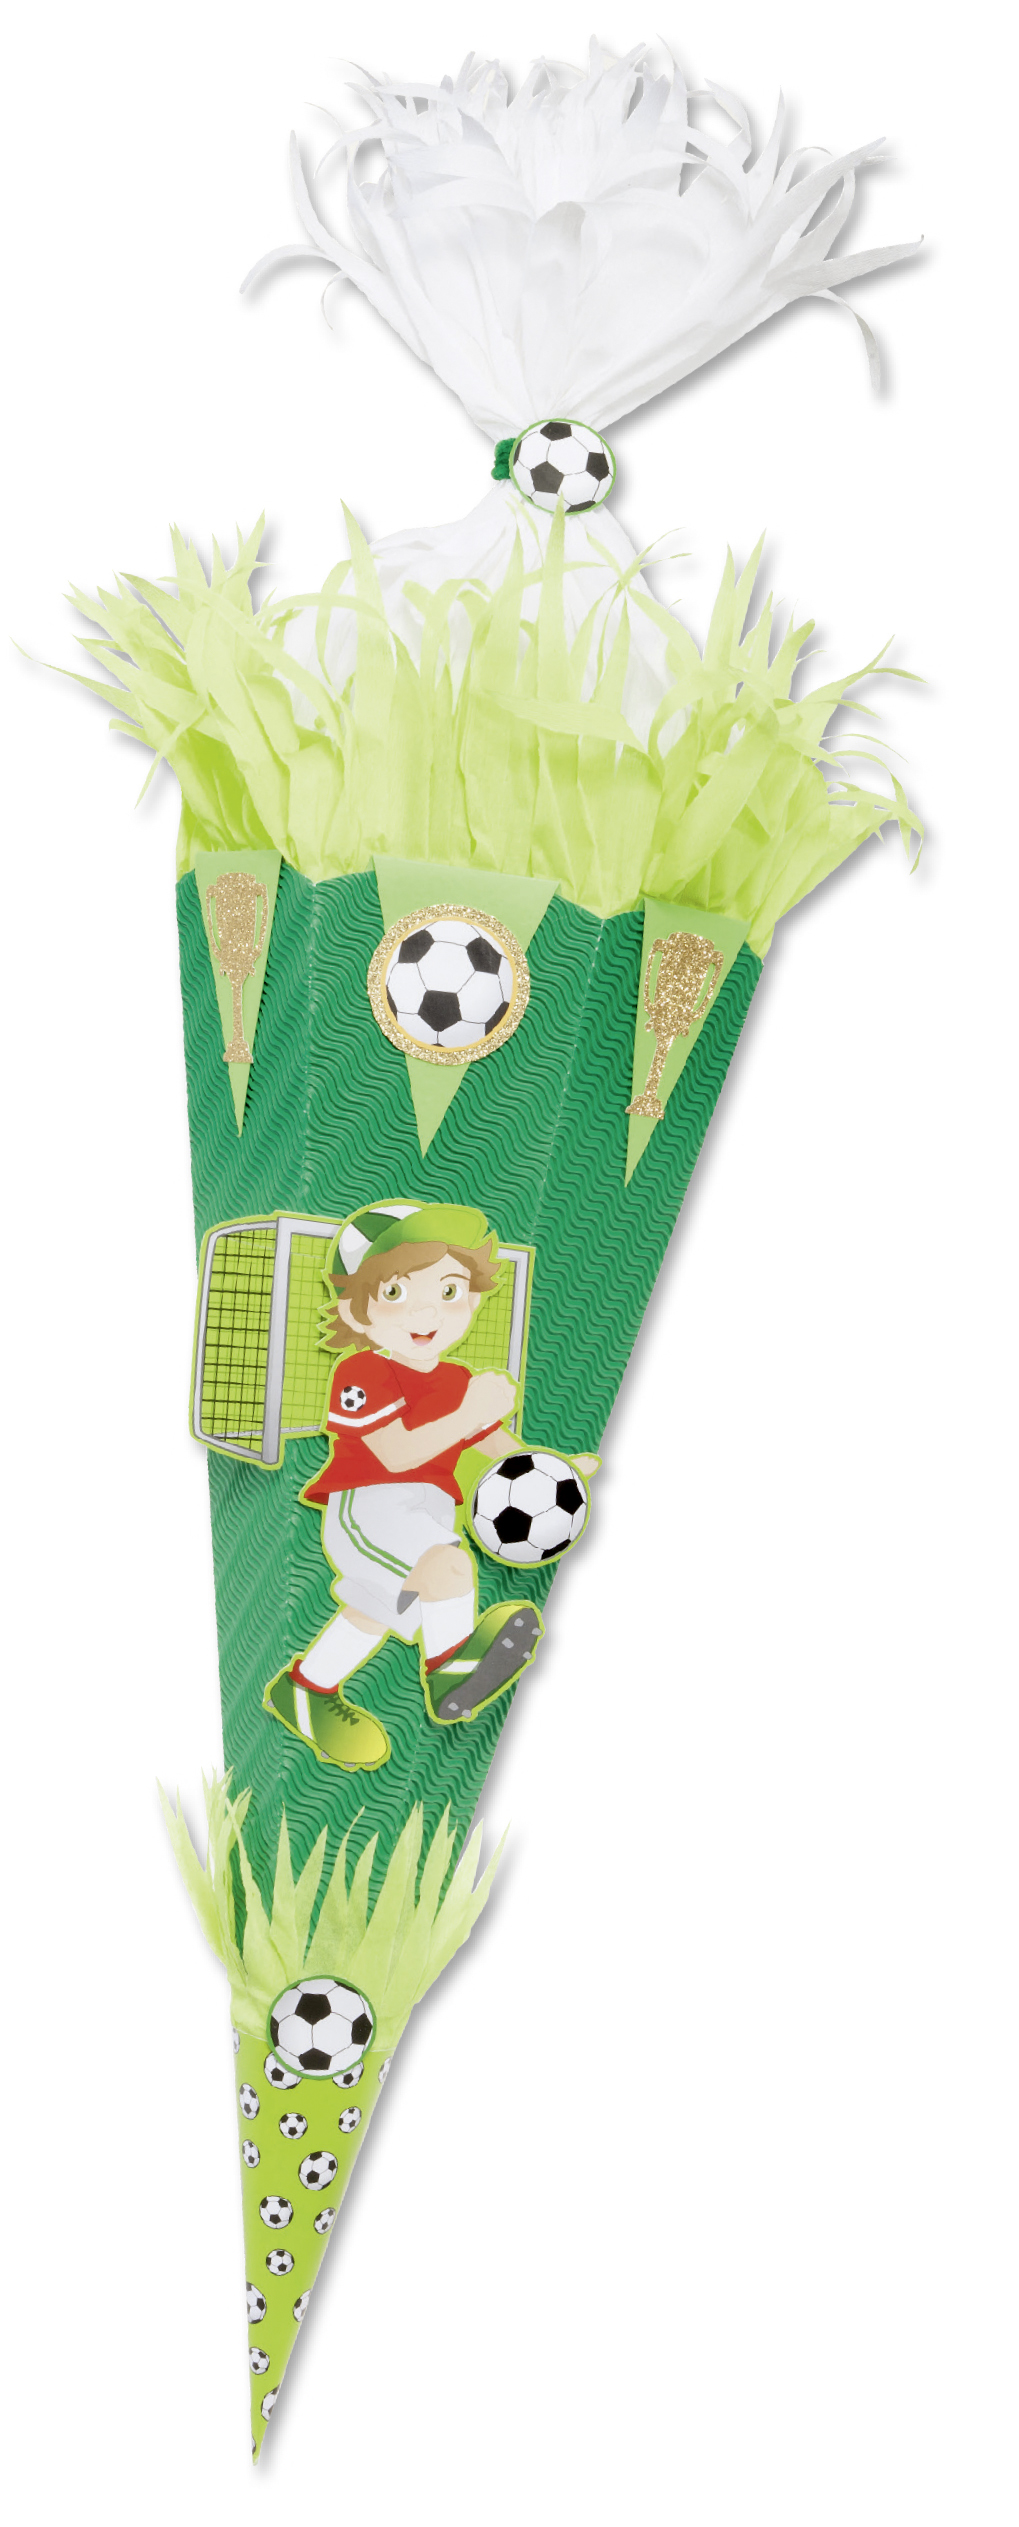 Folia Schultüten-Bastelset Fussballer